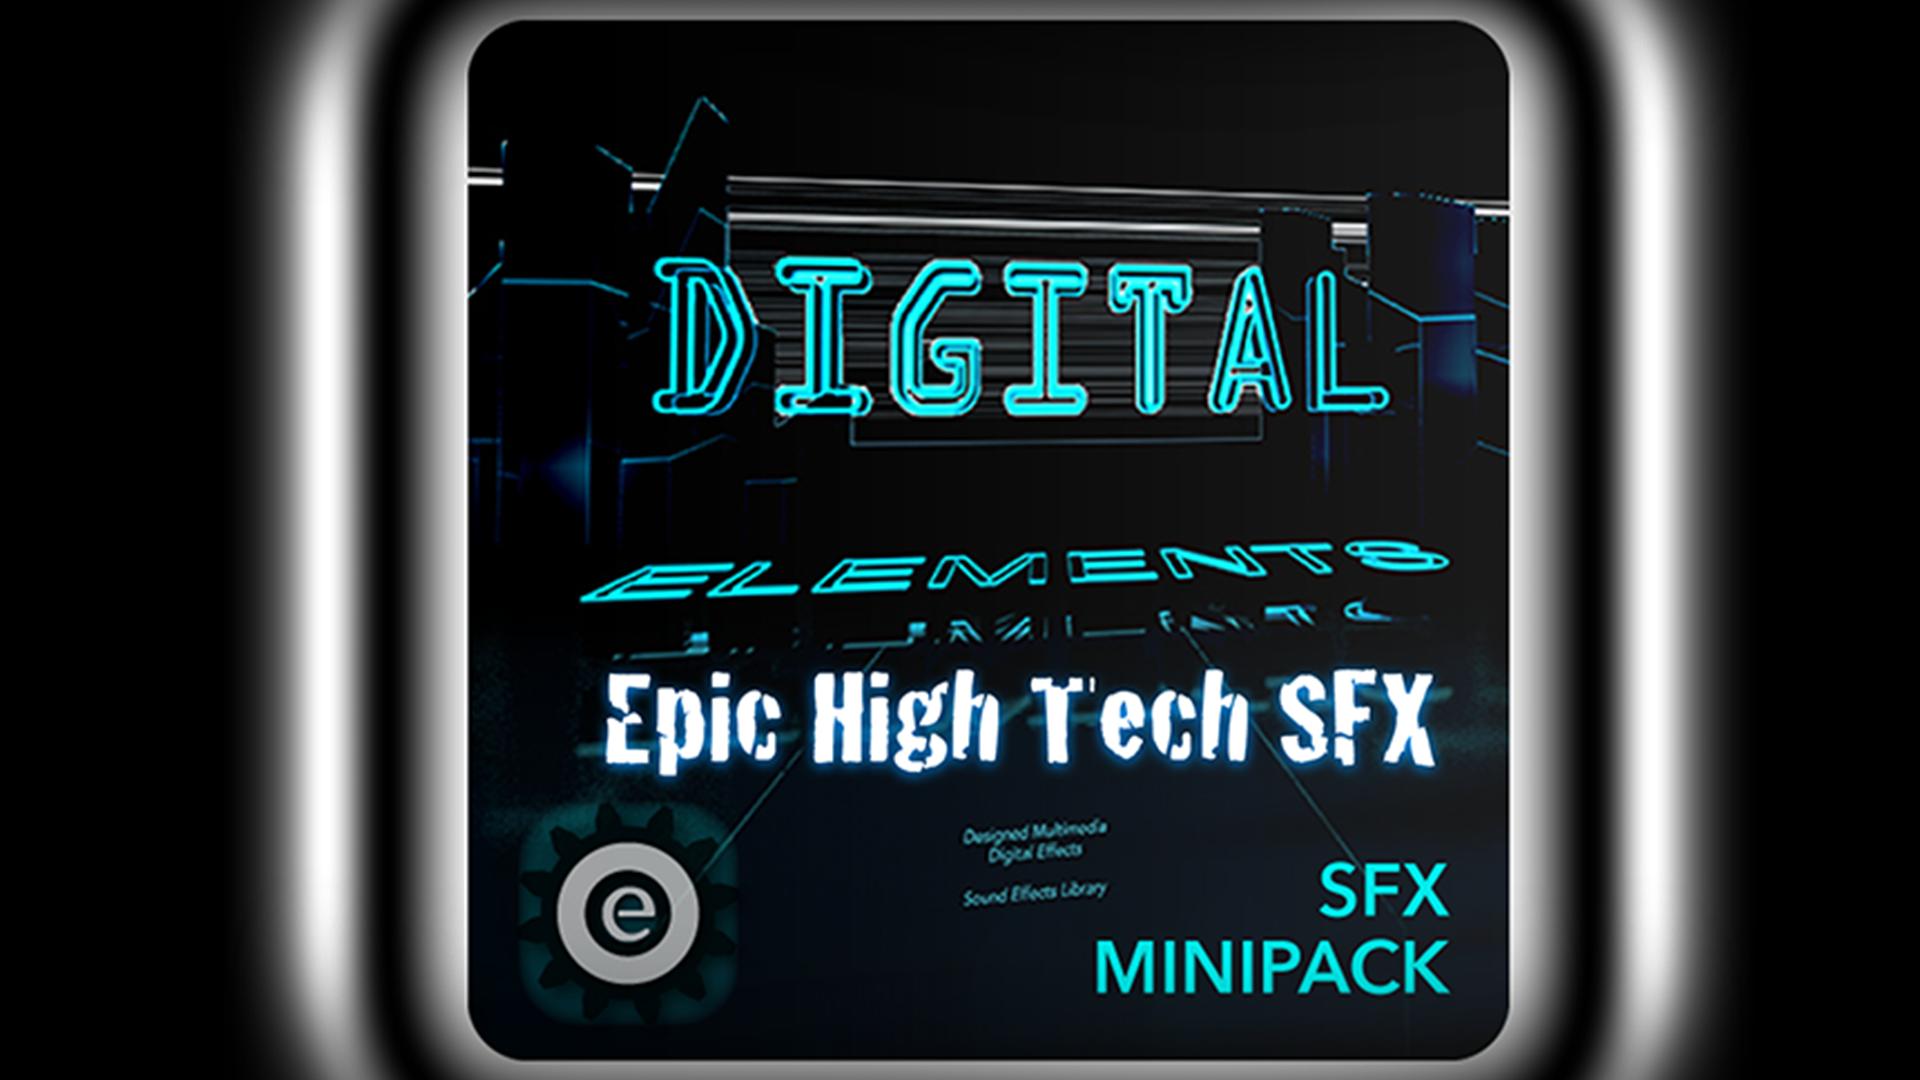 High Tech SFX (ESM Team)